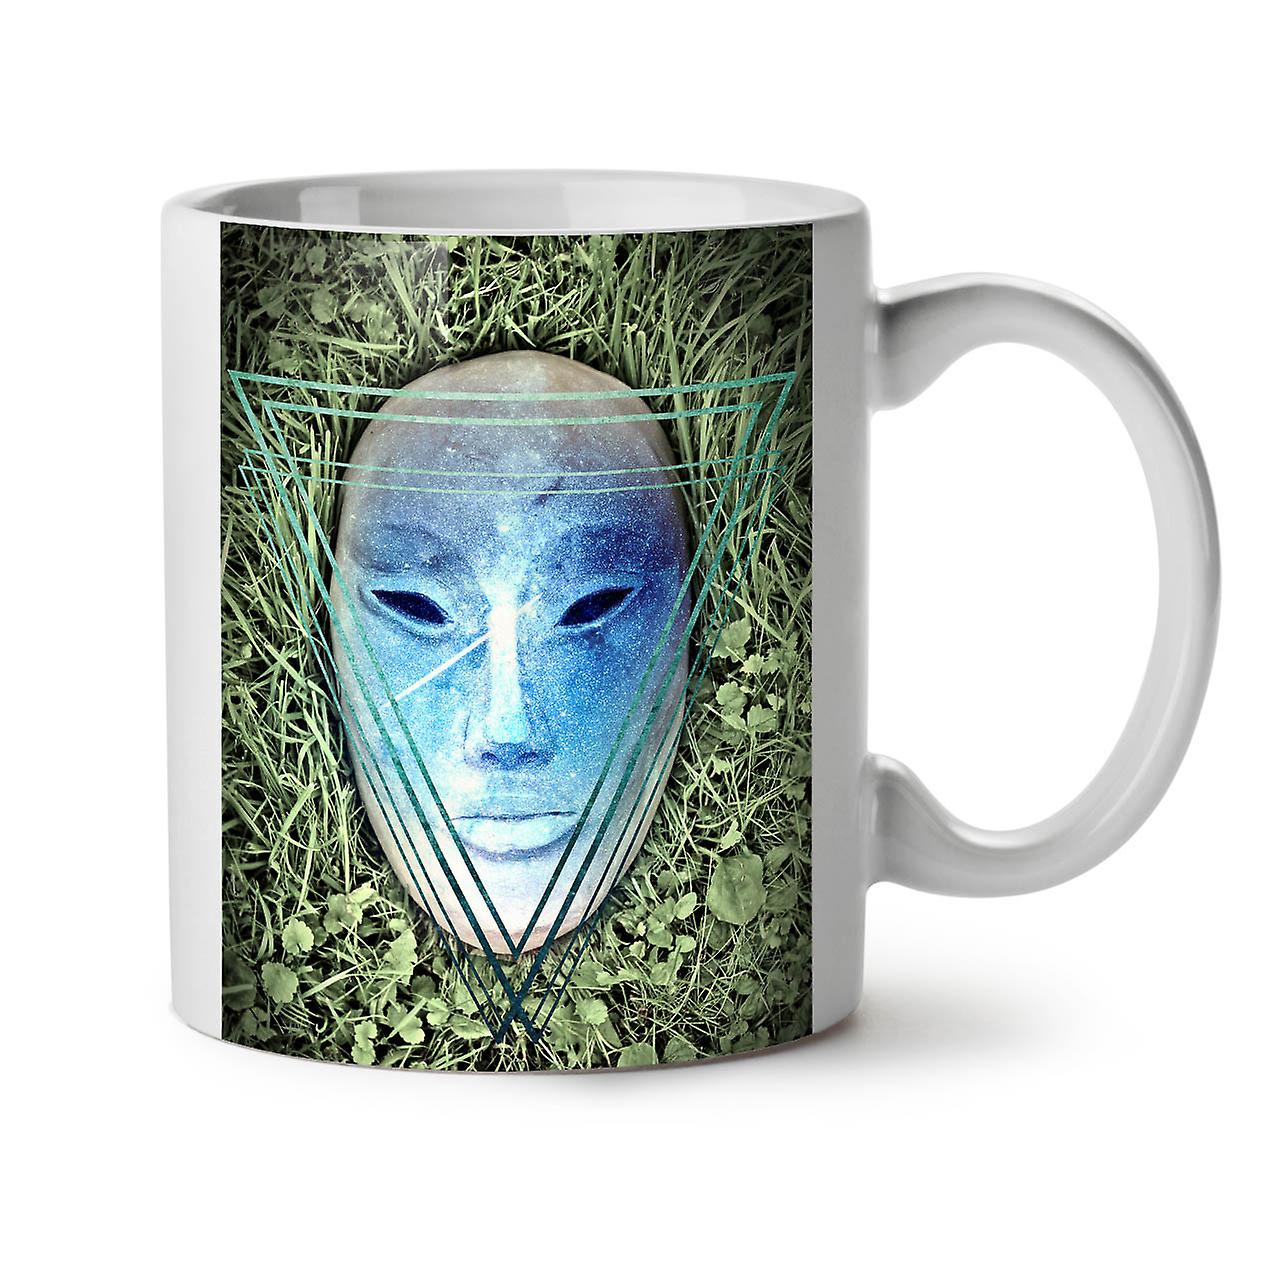 Mask OzWellcoda Being Mystic Tea New White 11 Ceramic Mug Coffee QCxoedBWEr